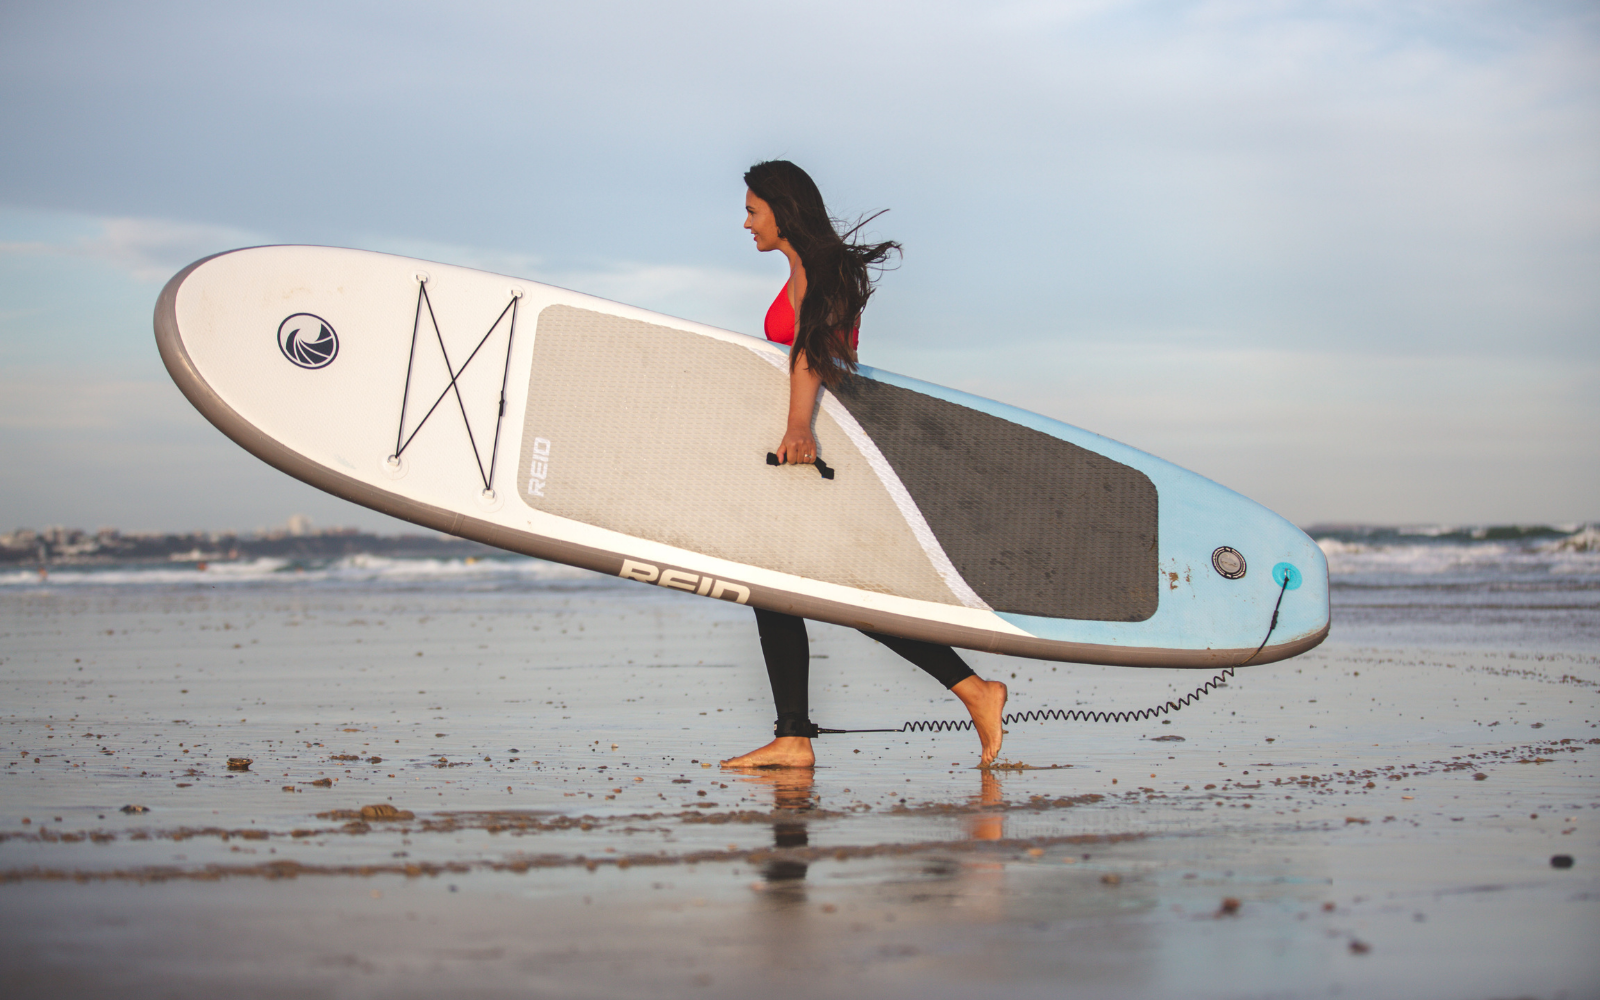 12 4 - Reid ® - Reid Santa Monica 10'6 Paddleboard